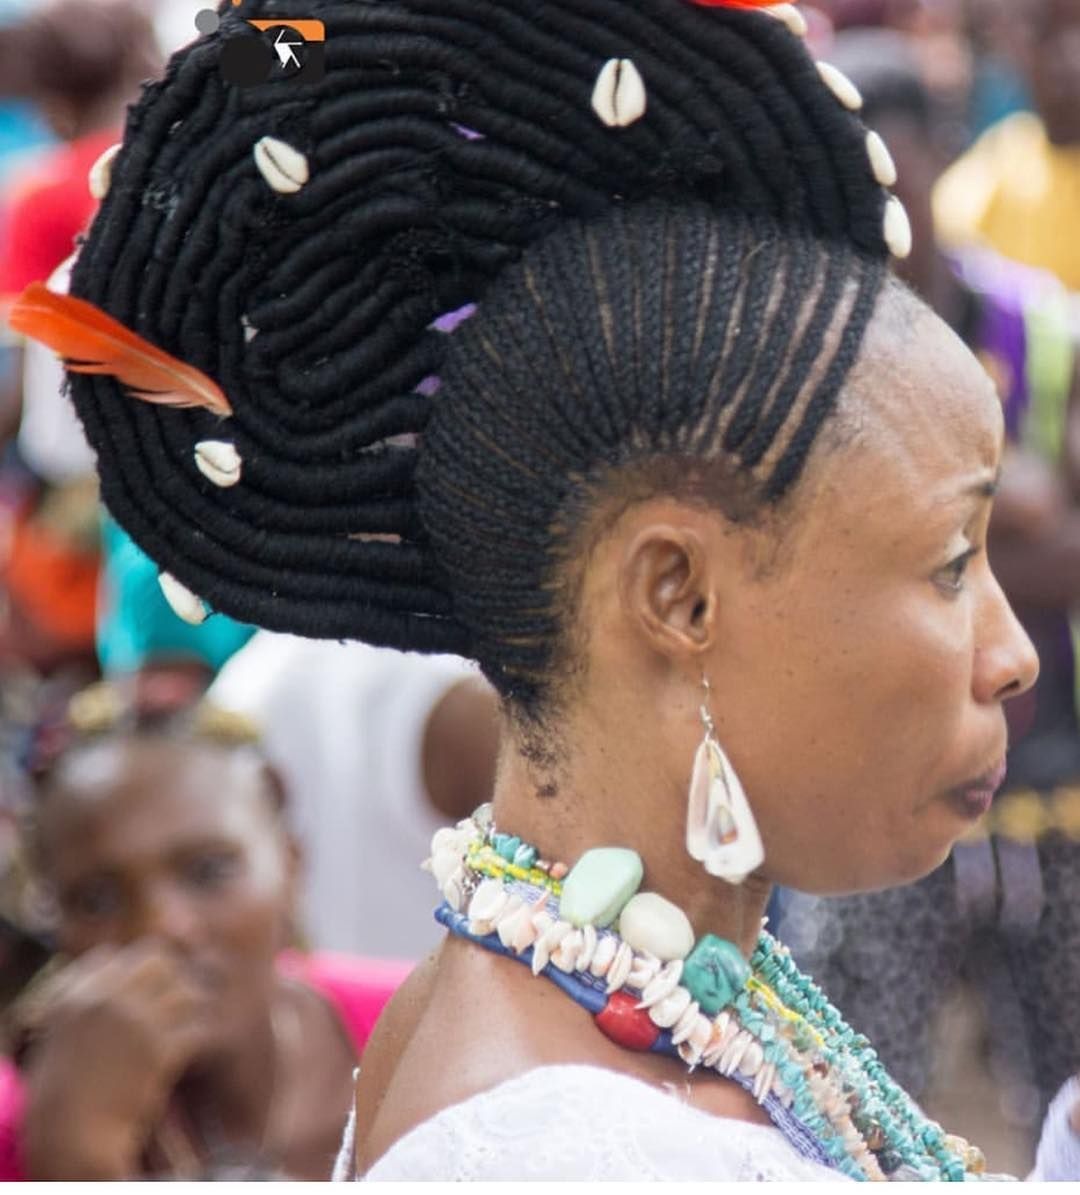 Mzle Le On Instagram Yoruba Hairstyles Photographer Unknown Nigeria Yoruba Braids Hairstyles Hair Hair Styles Historical Hairstyles Cool Hairstyles